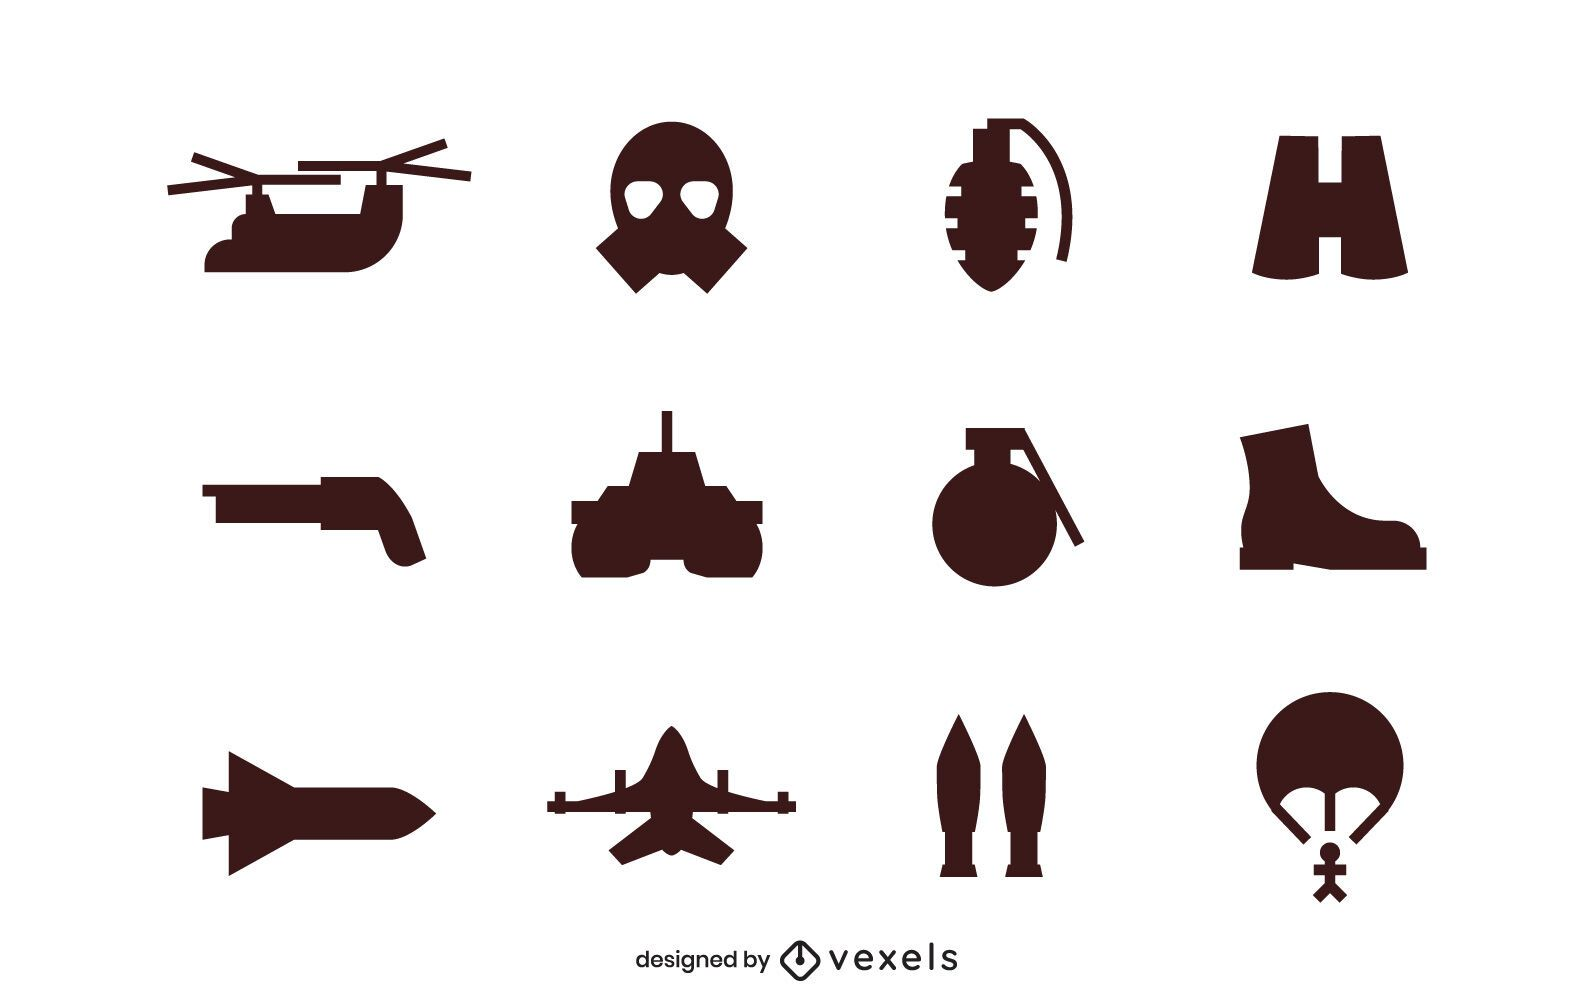 Conjunto de ícones de silhueta do exército